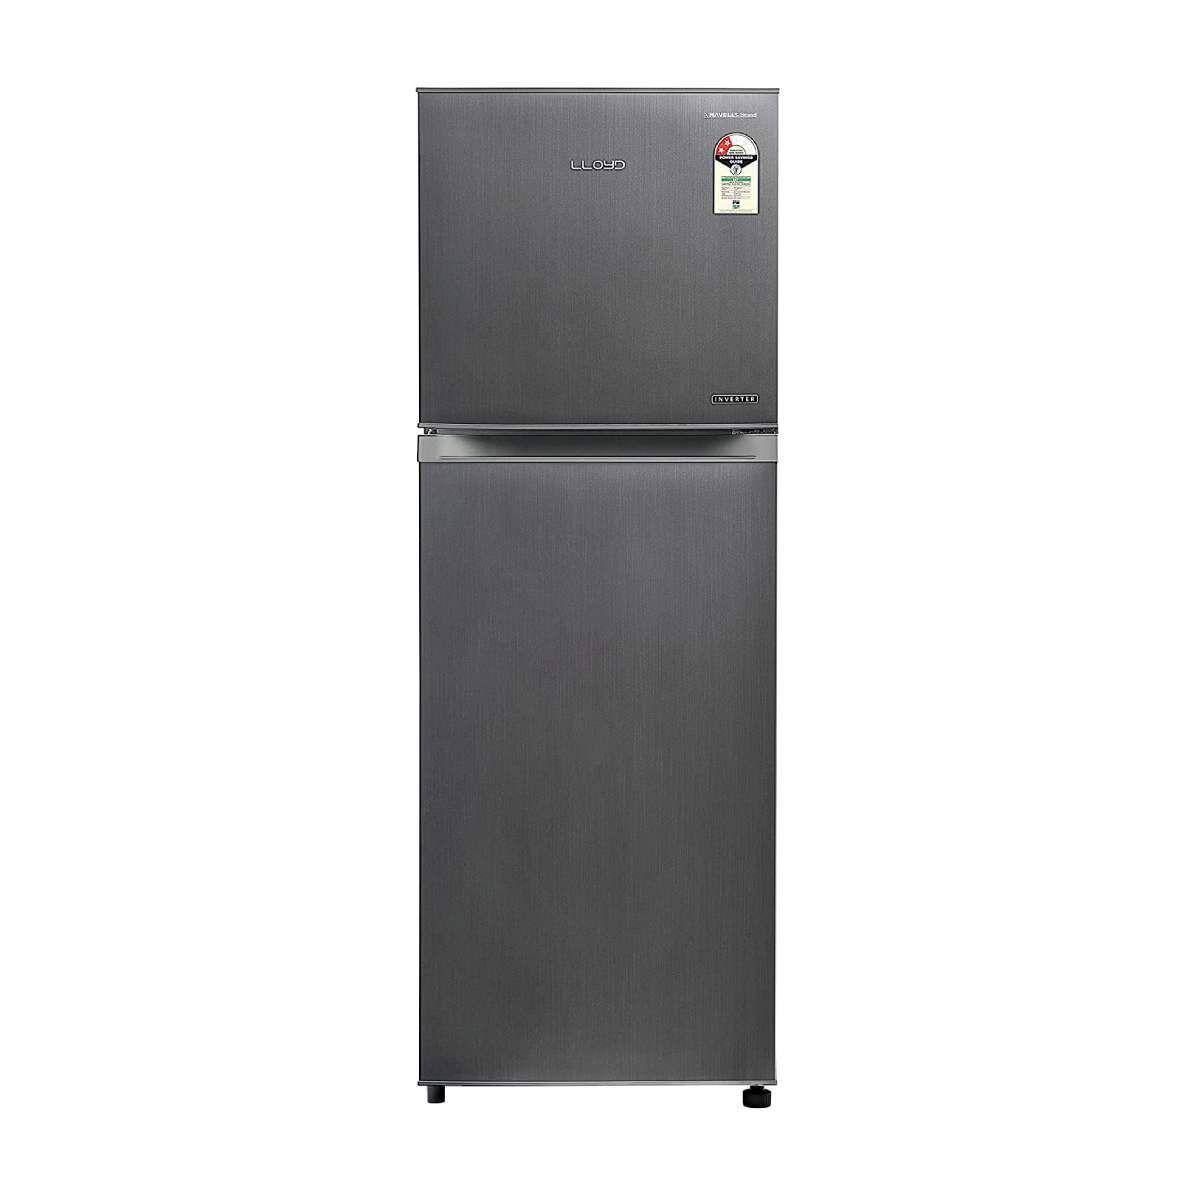 Lloyd 252 L 2 Star Inverter Double Door Refrigerator (GLFF262EDST1PB)